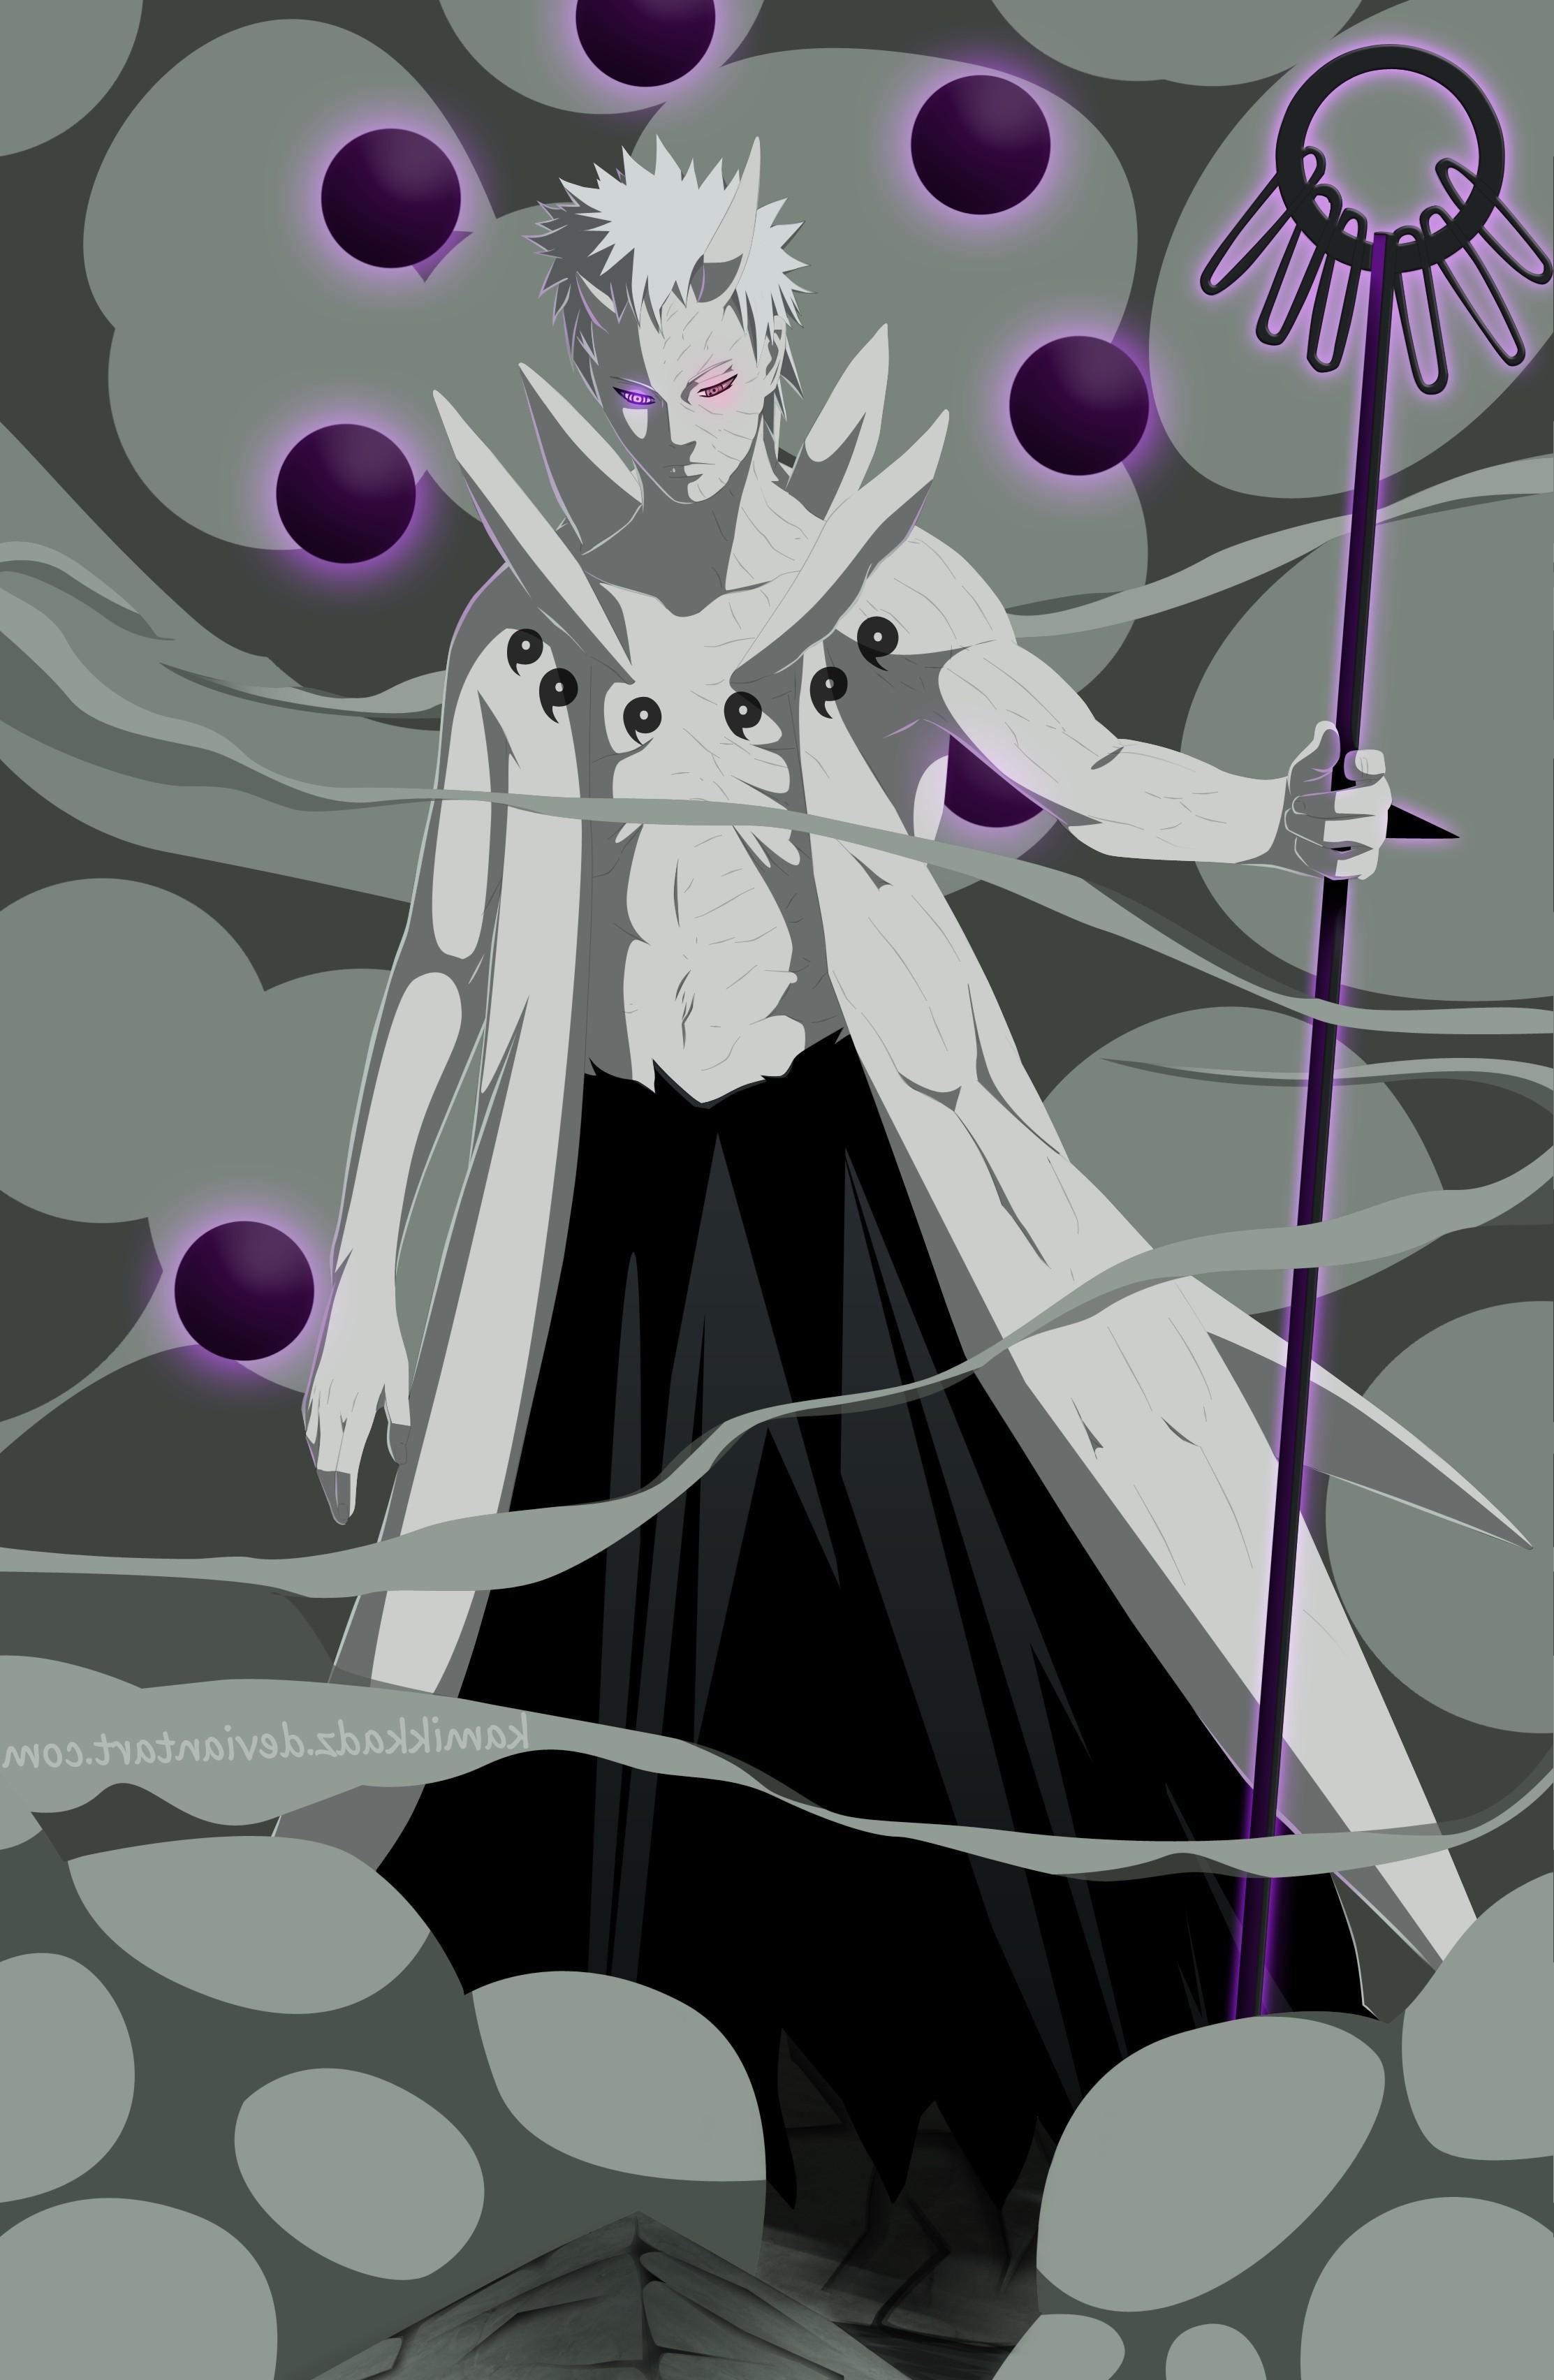 Sharingan Wallpaper Hd Naruto Shippuuden Anime Uchiha Obito Wallpapers Hd